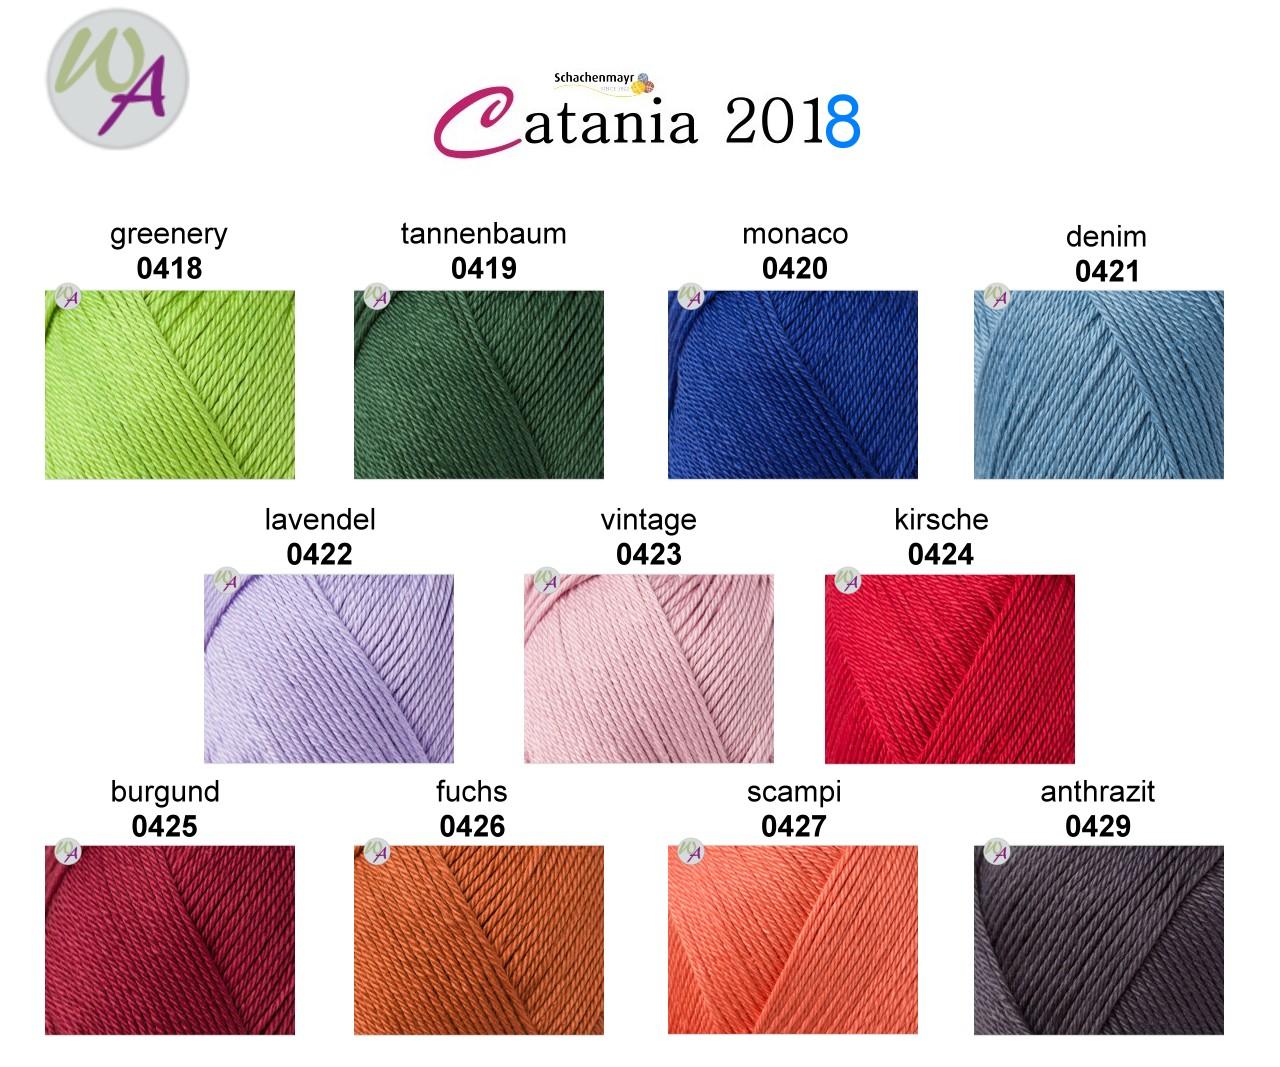 Catania Wolle Amigurumi 100% Baumwollgarn Schachenmayr   Etsy   1067x1280